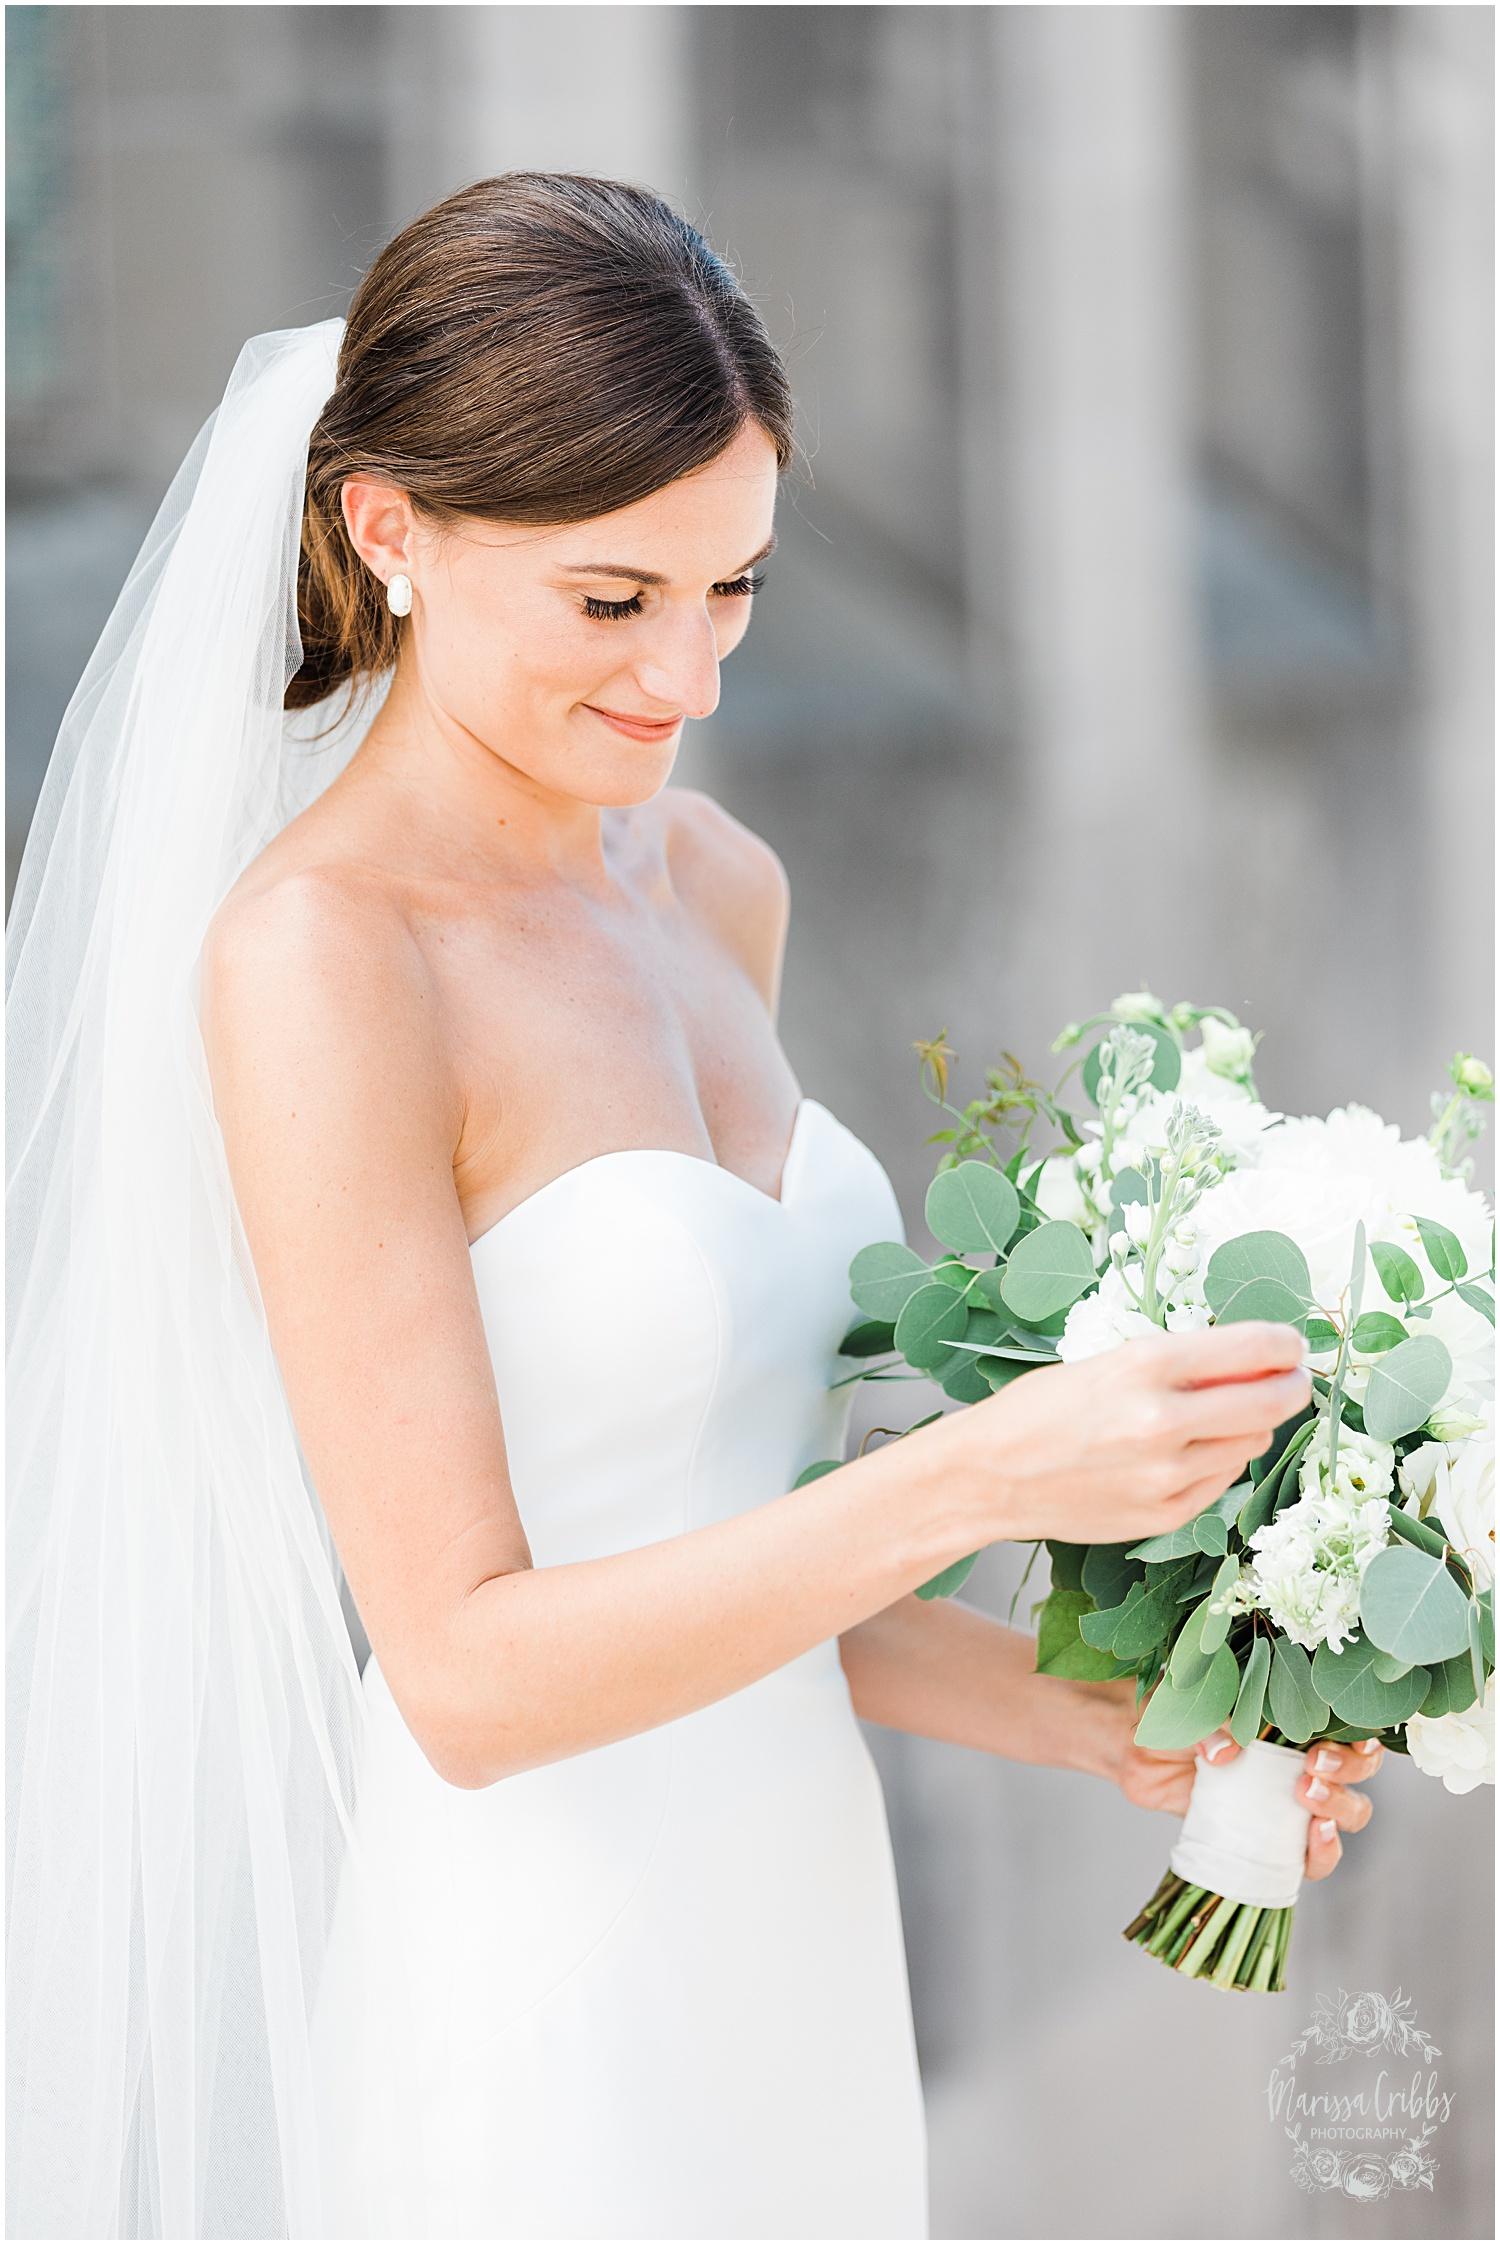 JOANNE & GEORGE MARRIED BLOG | MARISSA CRIBBS PHOTOGRAPHY | THE ABBOTT | KANSAS CITY WEDDING PHOTOS_9046.jpg